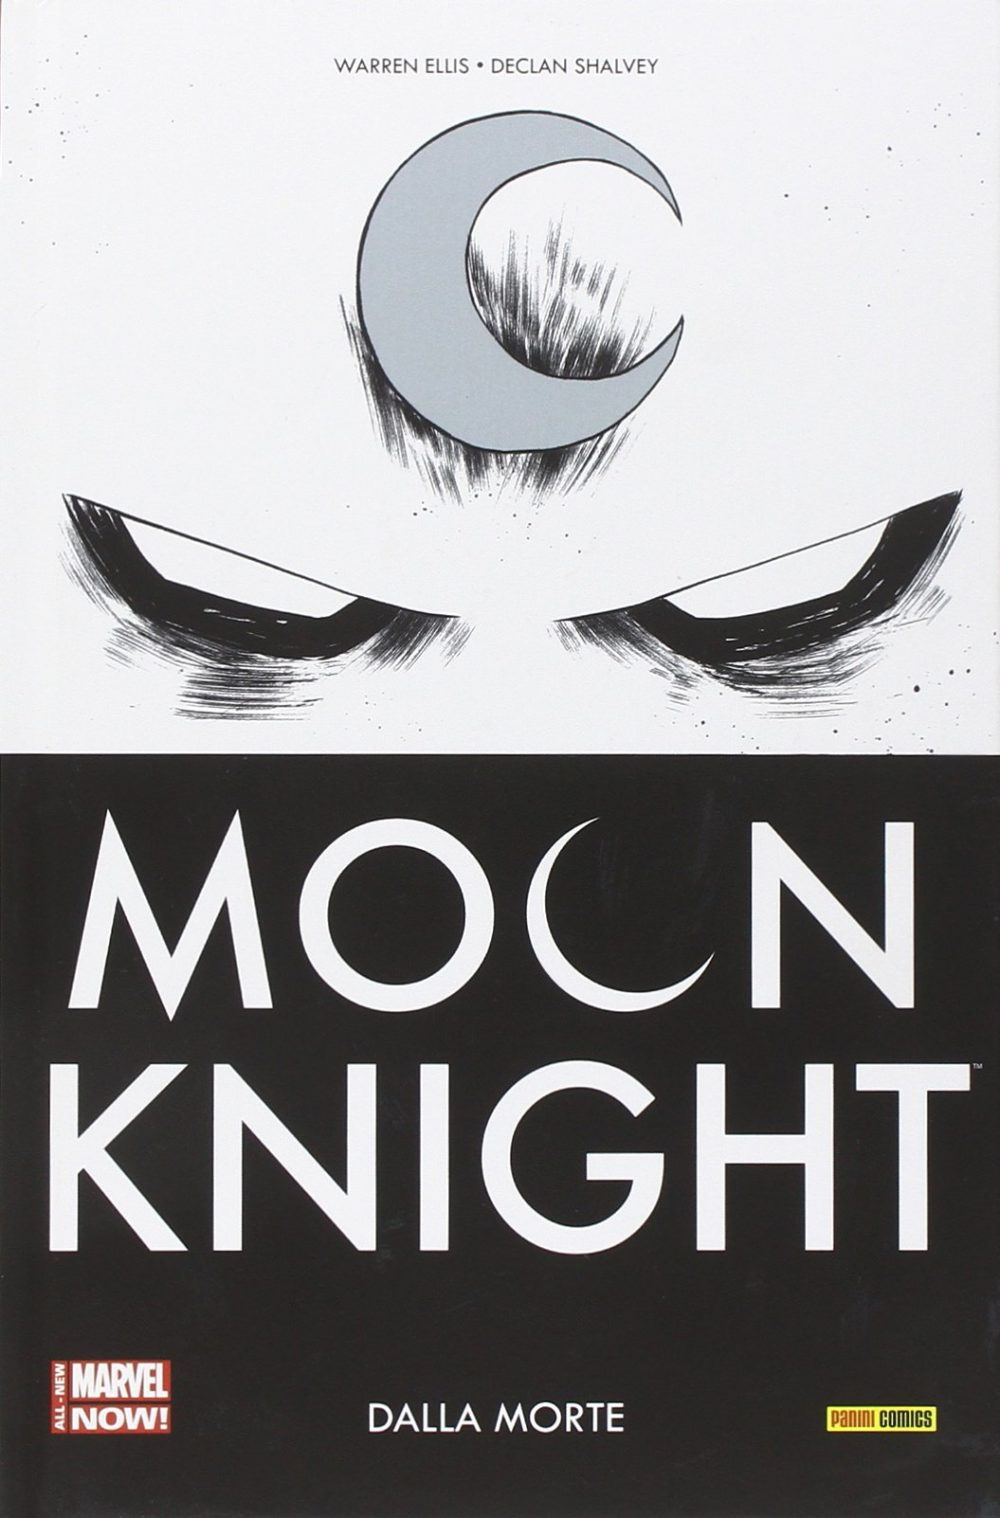 Moon Knight vol. 1: Dalla Morte, di Warren Ellis e Declan Shalvey - Panini Comics